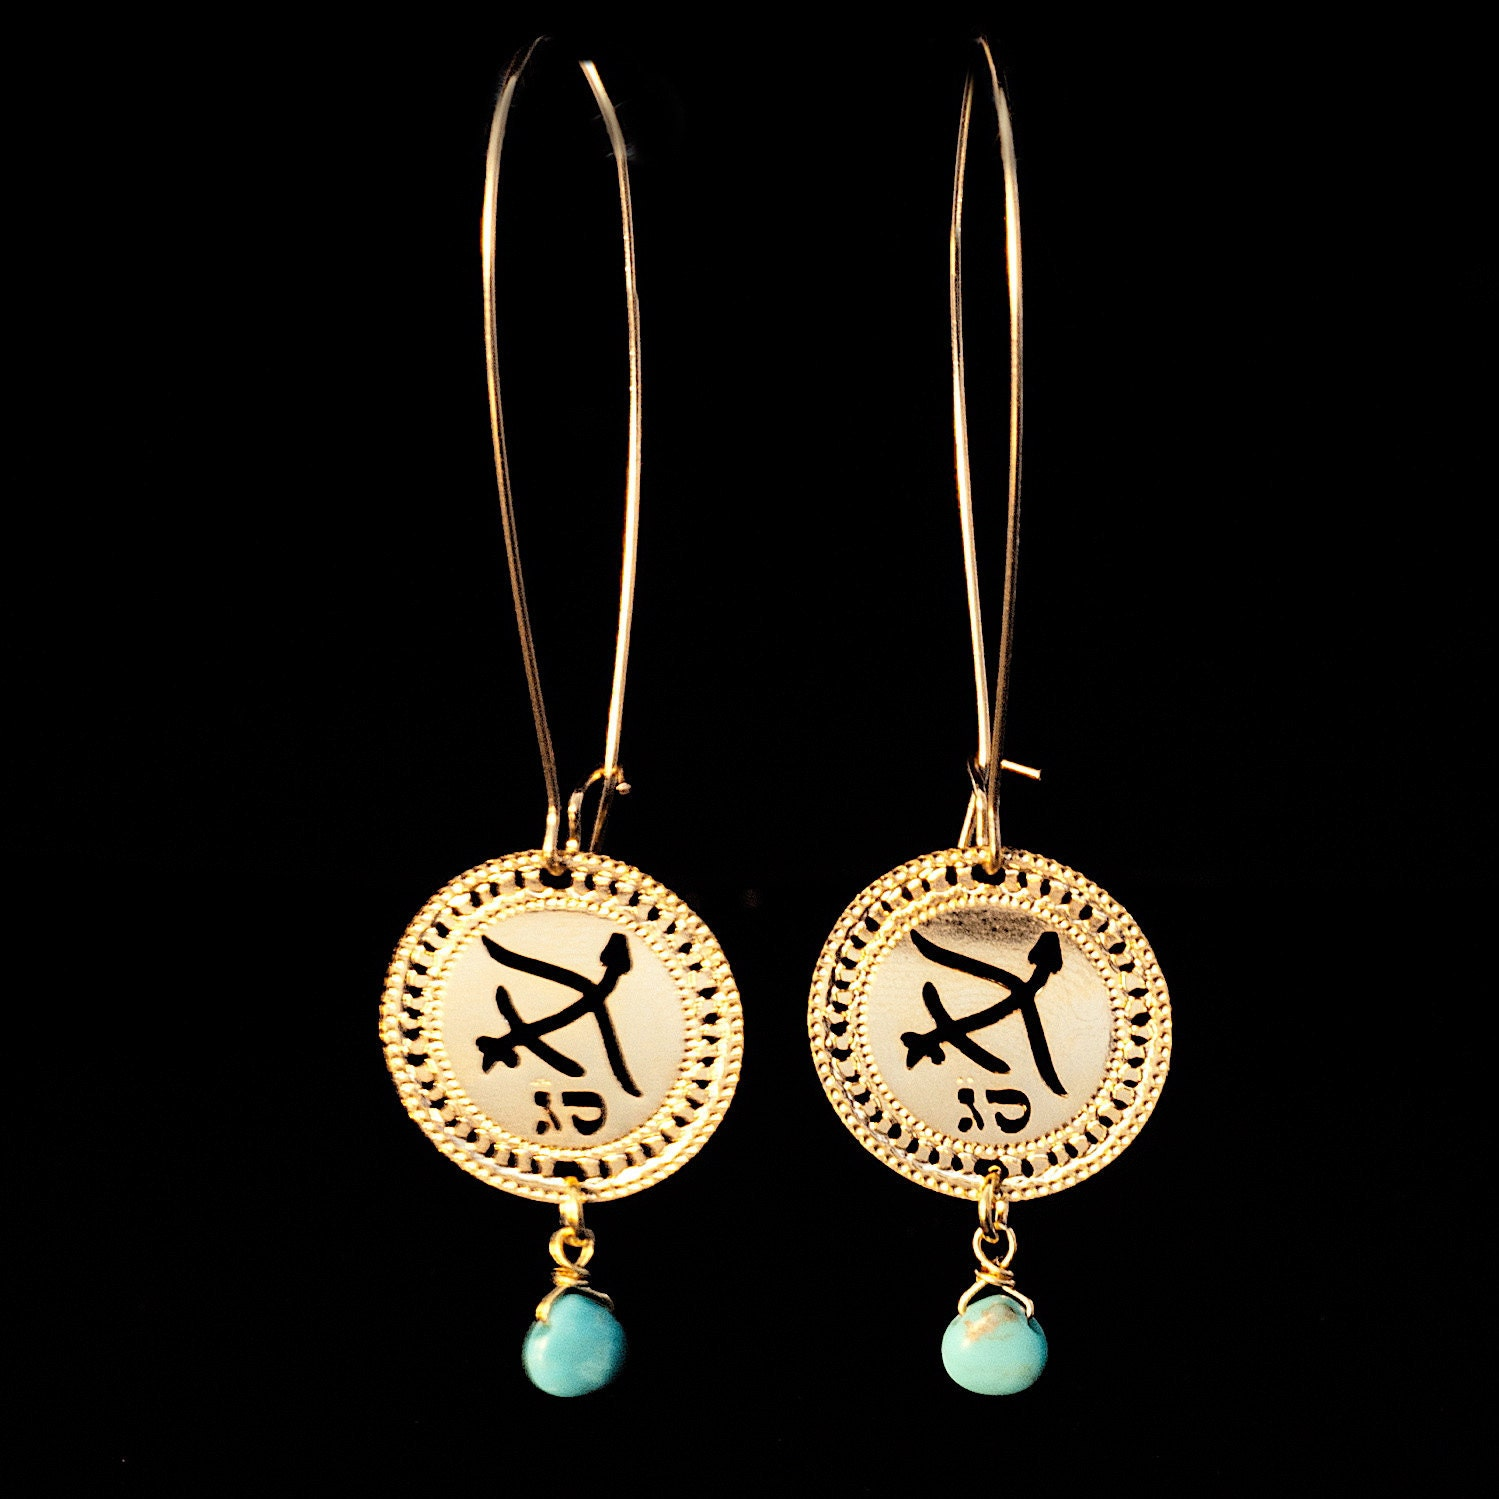 sagittarius earrings turquoise gold earrings by kelkajewelry